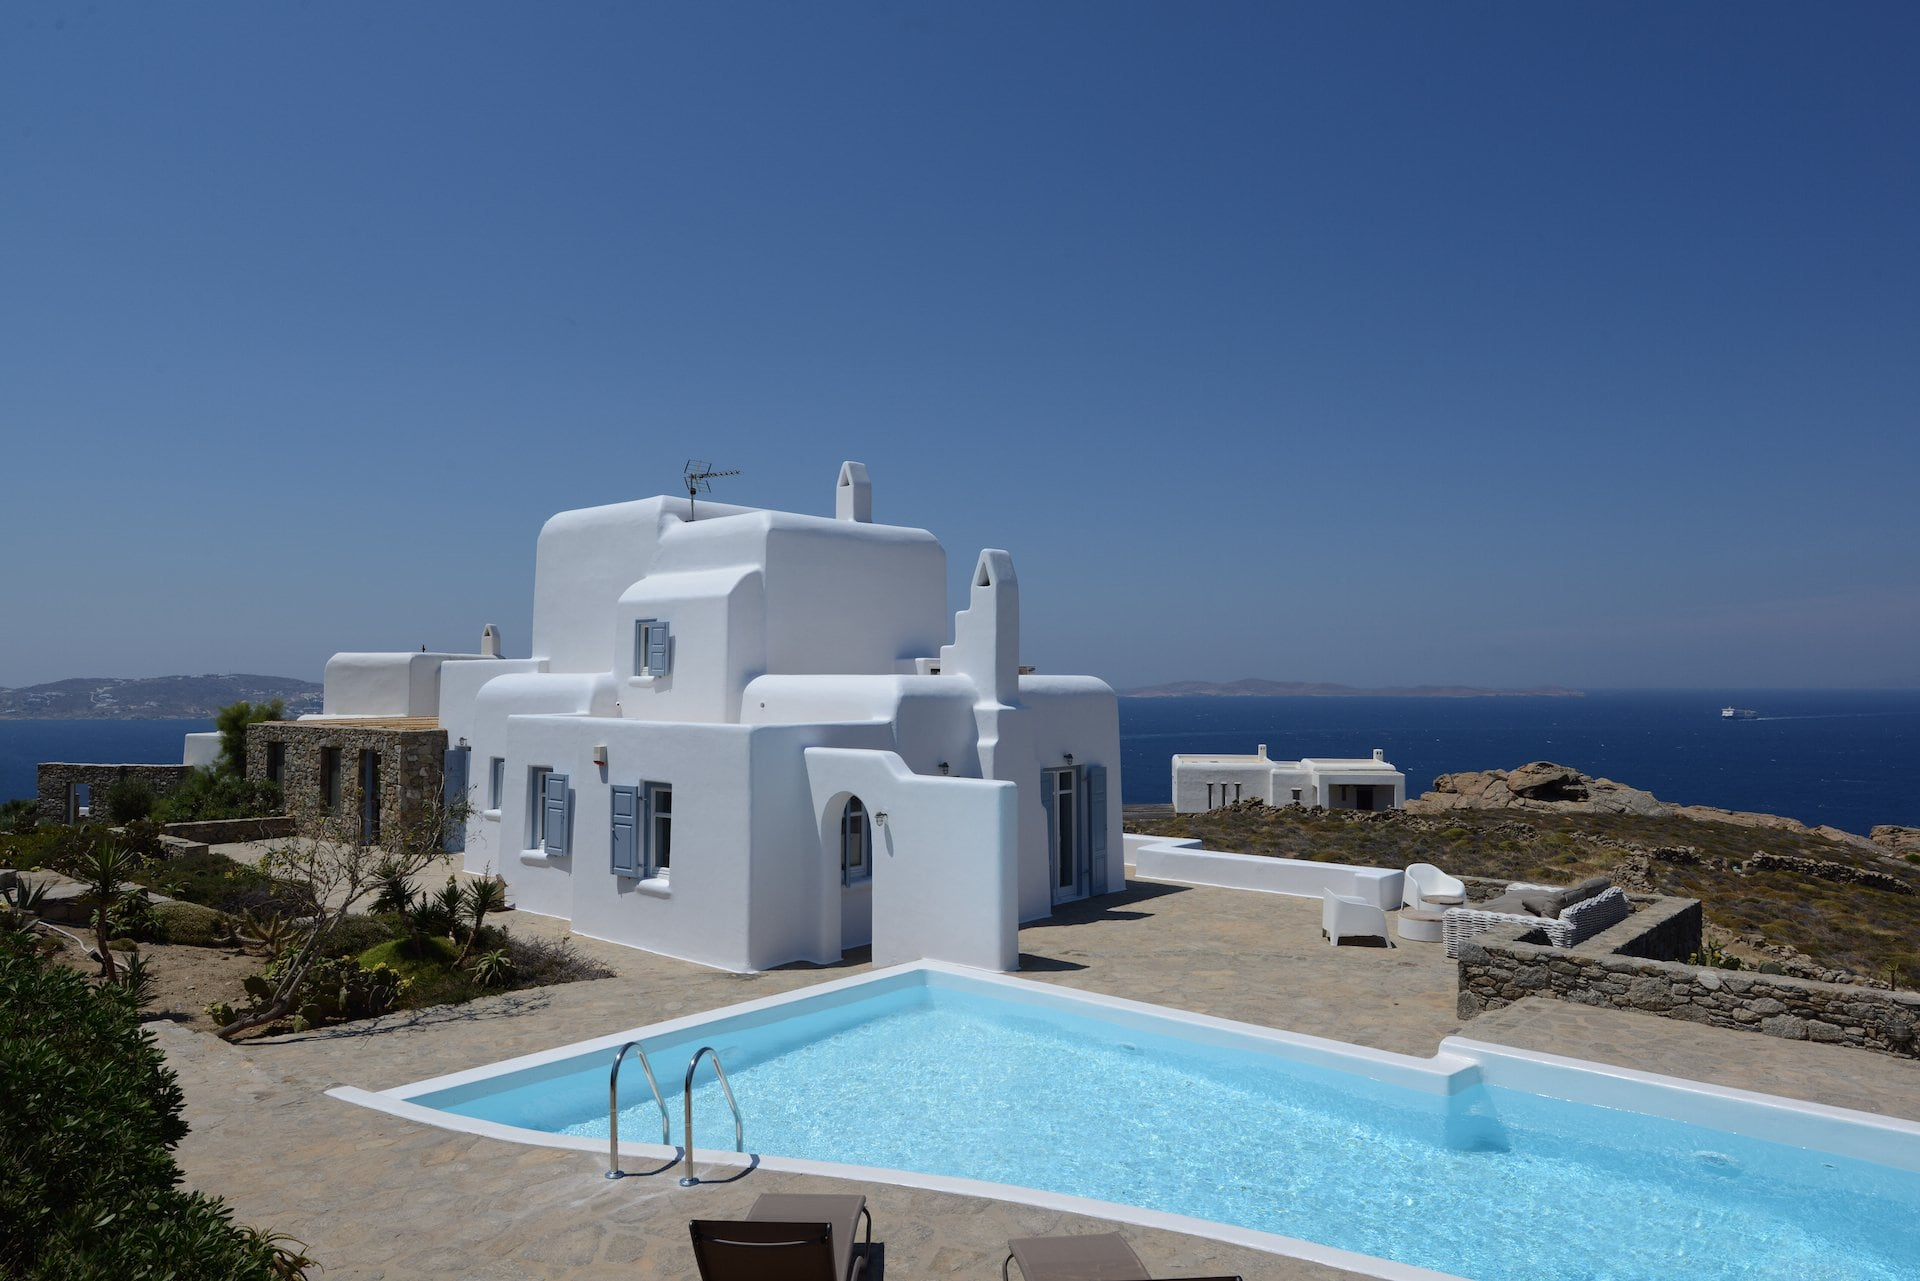 Maison, Mykonos - Ref GR-3602